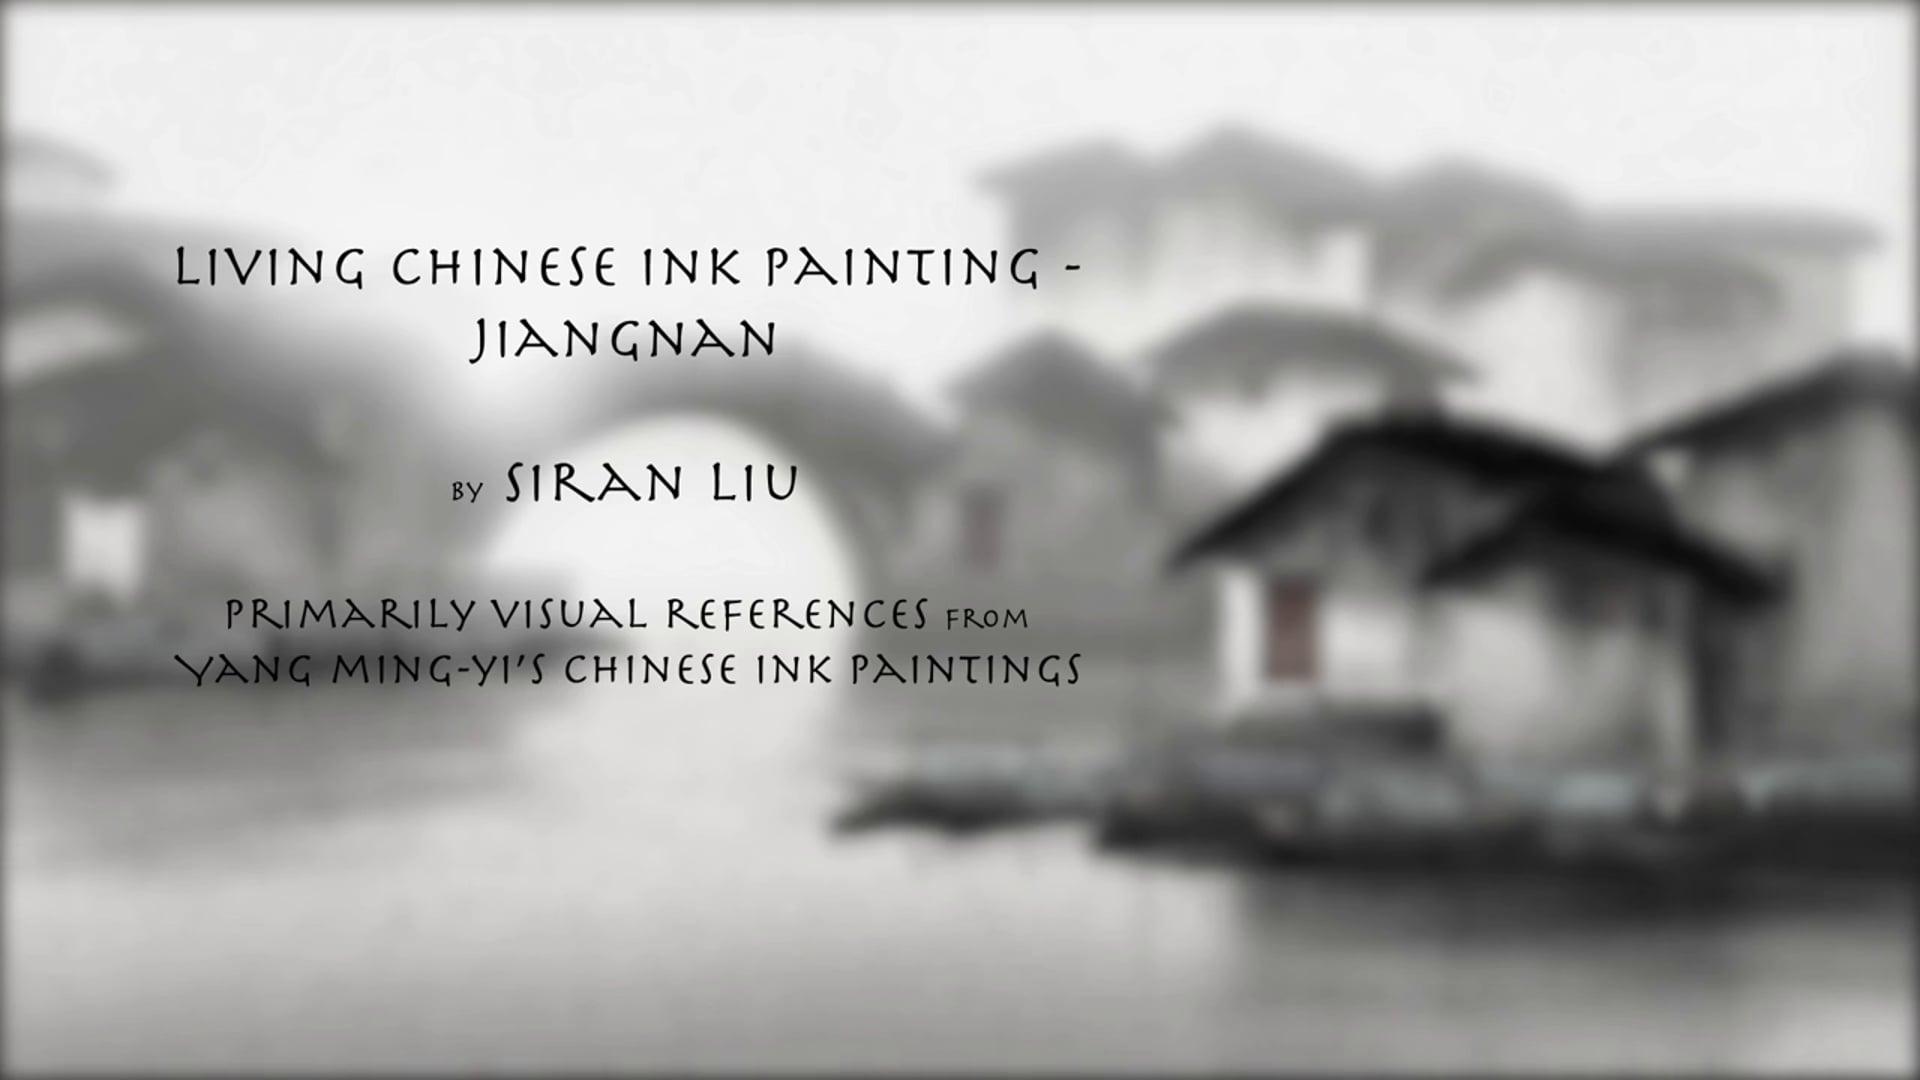 Living Chinese Ink Painting - Jiangnan